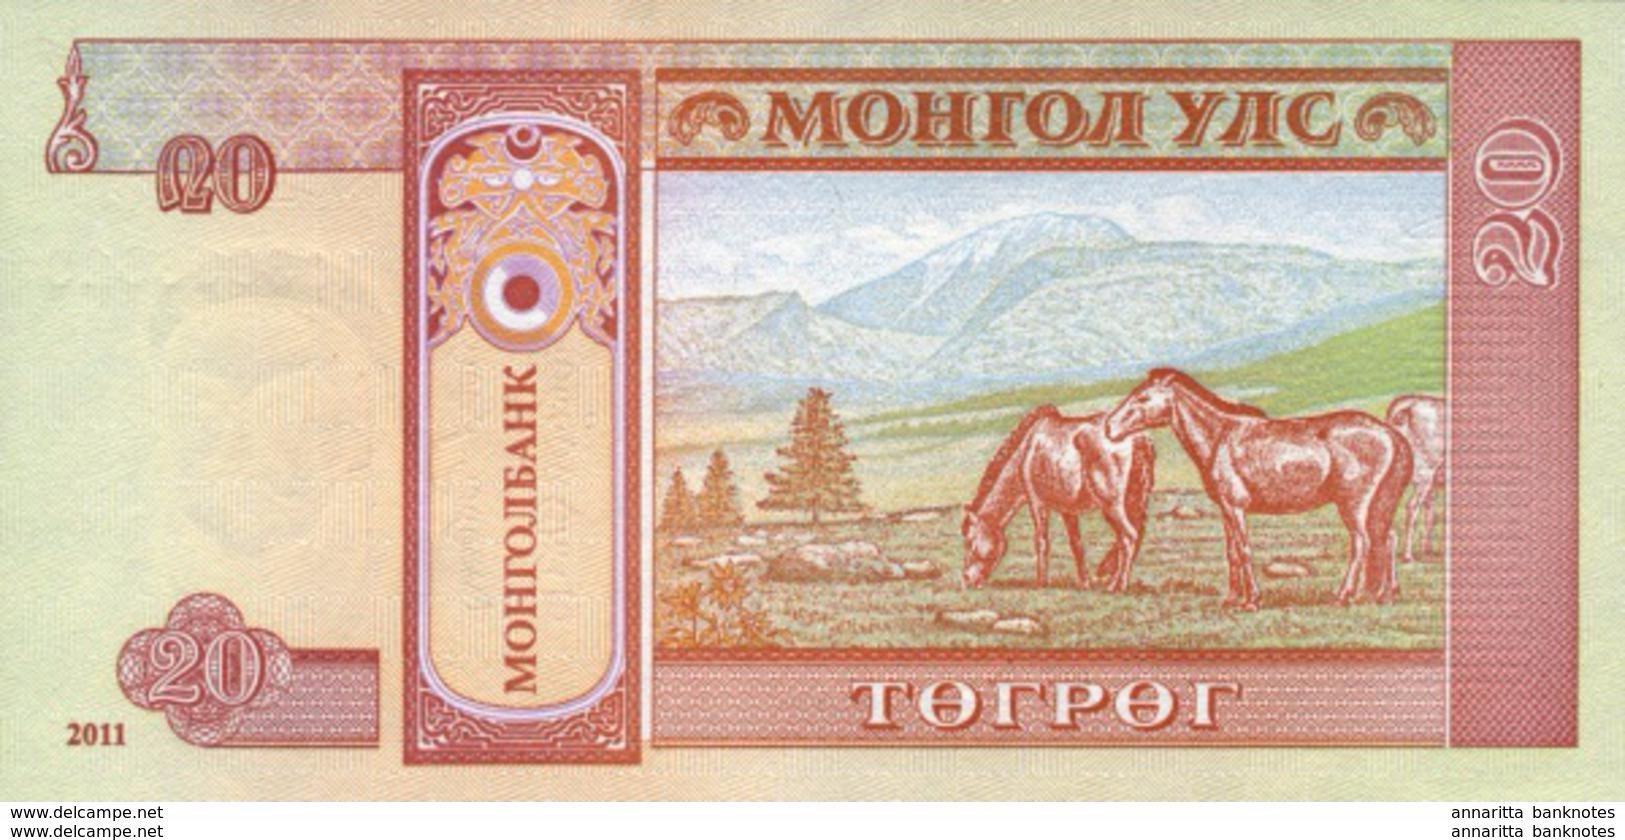 MONGOLIA 20 ТӨГРӨГ (TÖGRÖG) 2011 P-63f UNC  [MN431b] - Mongolie